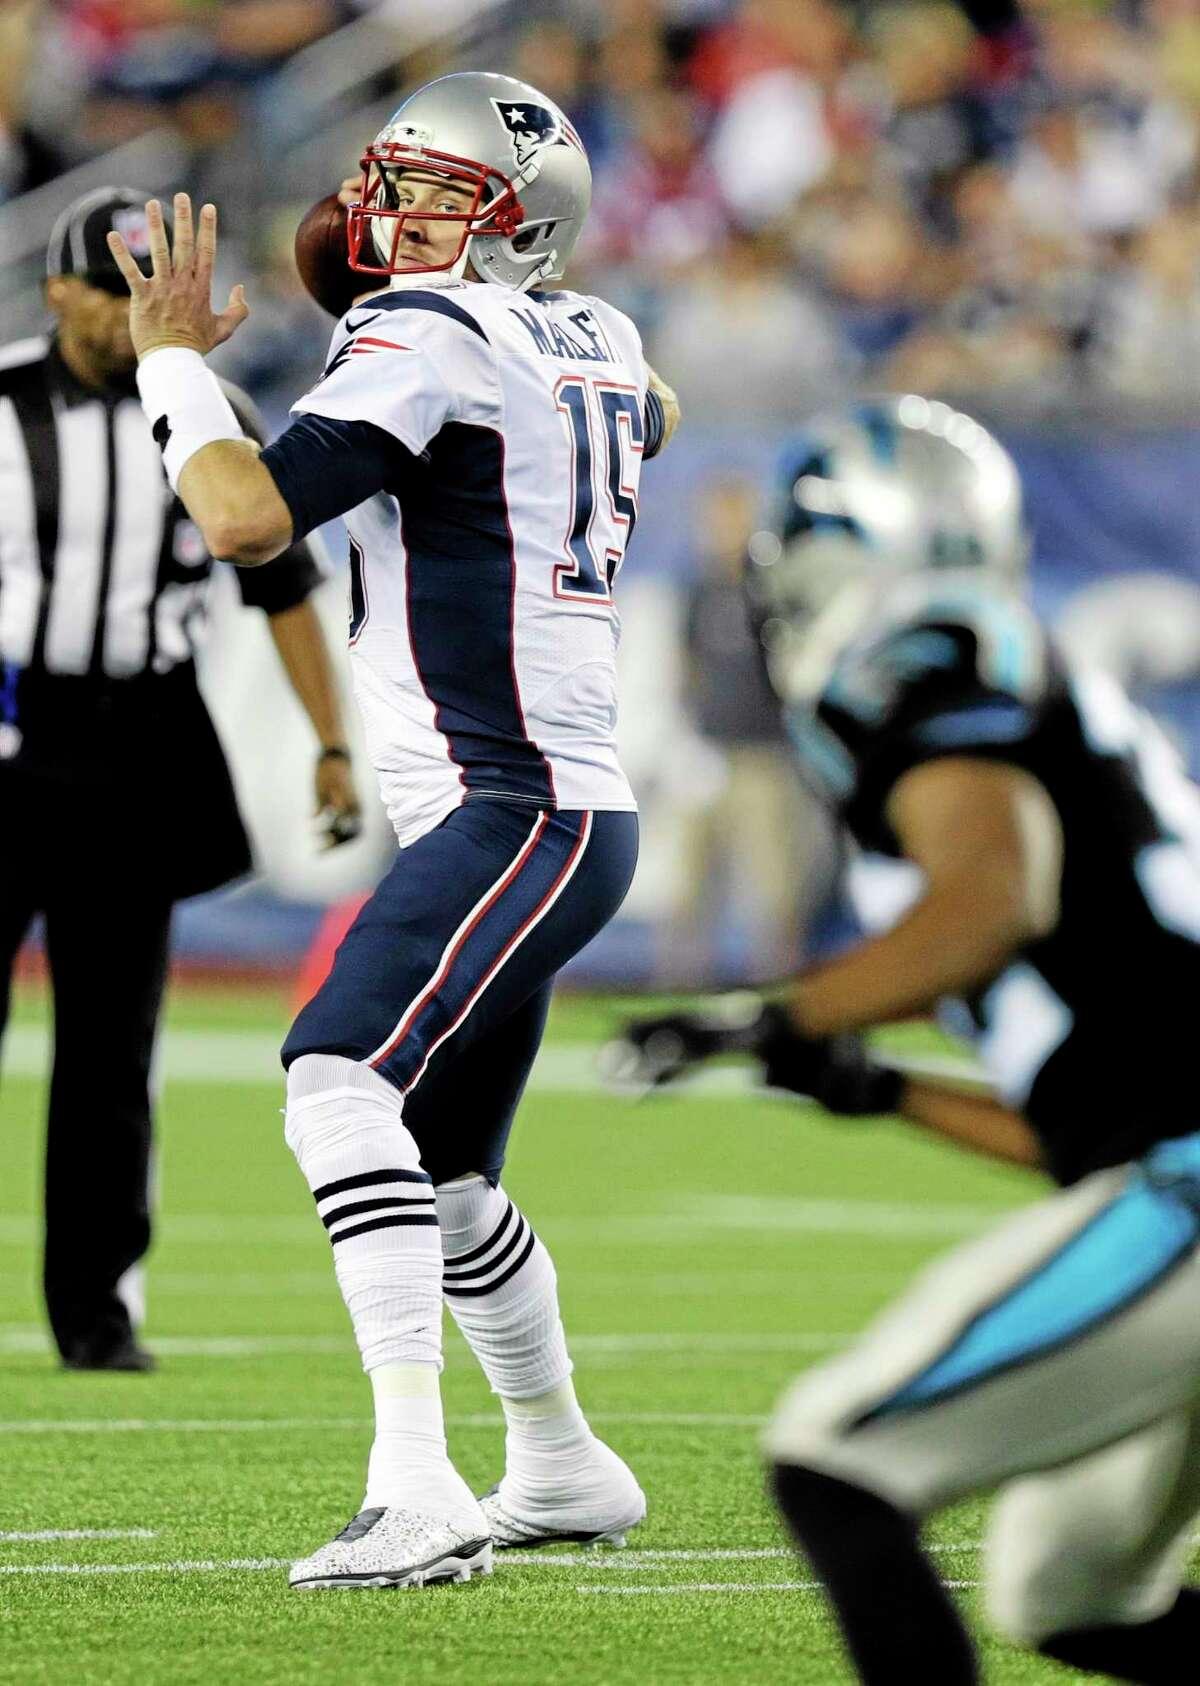 Patriots quarterback Ryan Mallett was traded to the Houston Texans on Sunday.